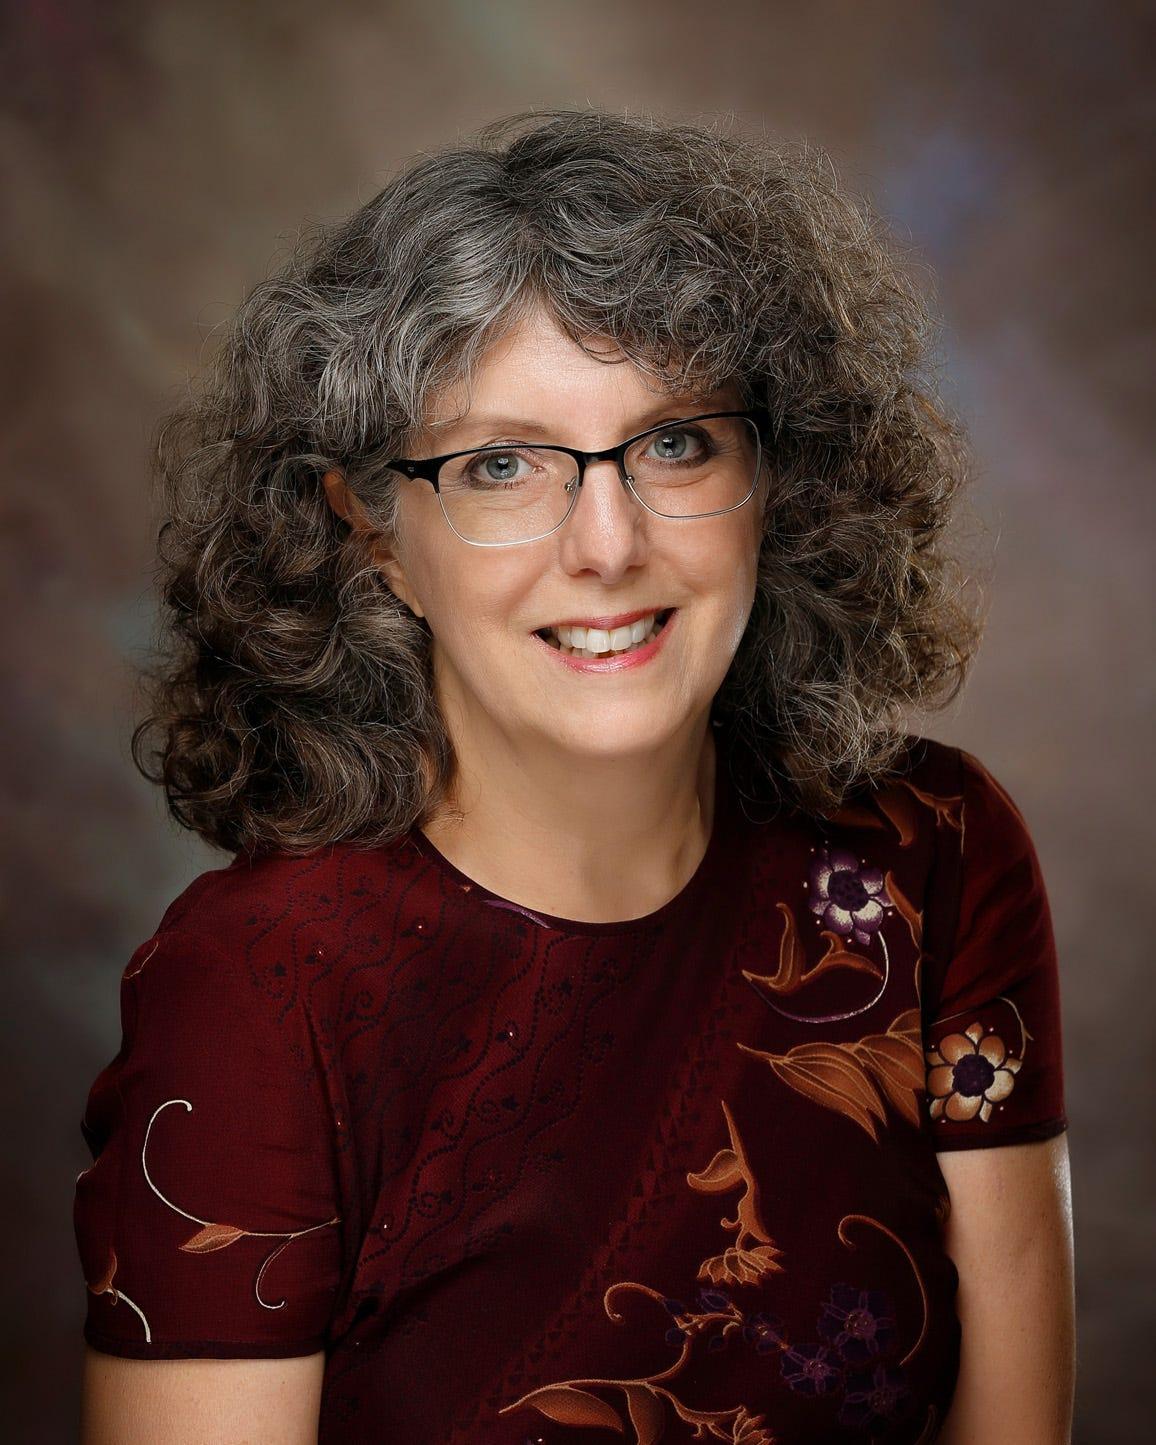 636512756560817119-PamelaTronetti FLORIDA TODAY Business Briefs: Parrish, Launch FCU, Brevard Public Schools